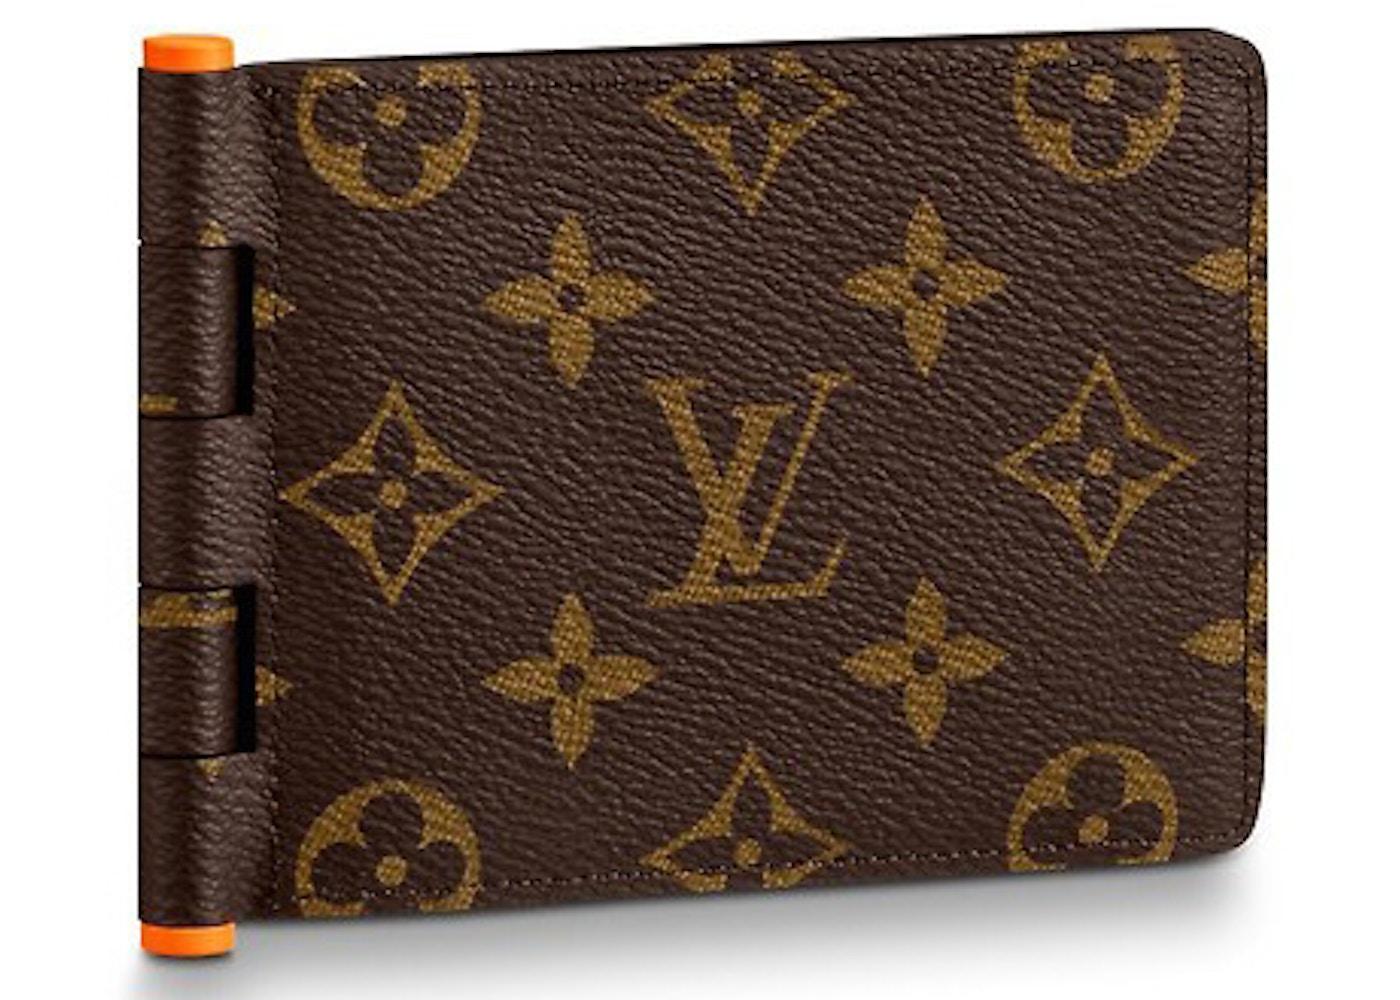 3c7d033f860 Louis Vuitton Multiple Wallet Monogram Solar Ray Orange Brown